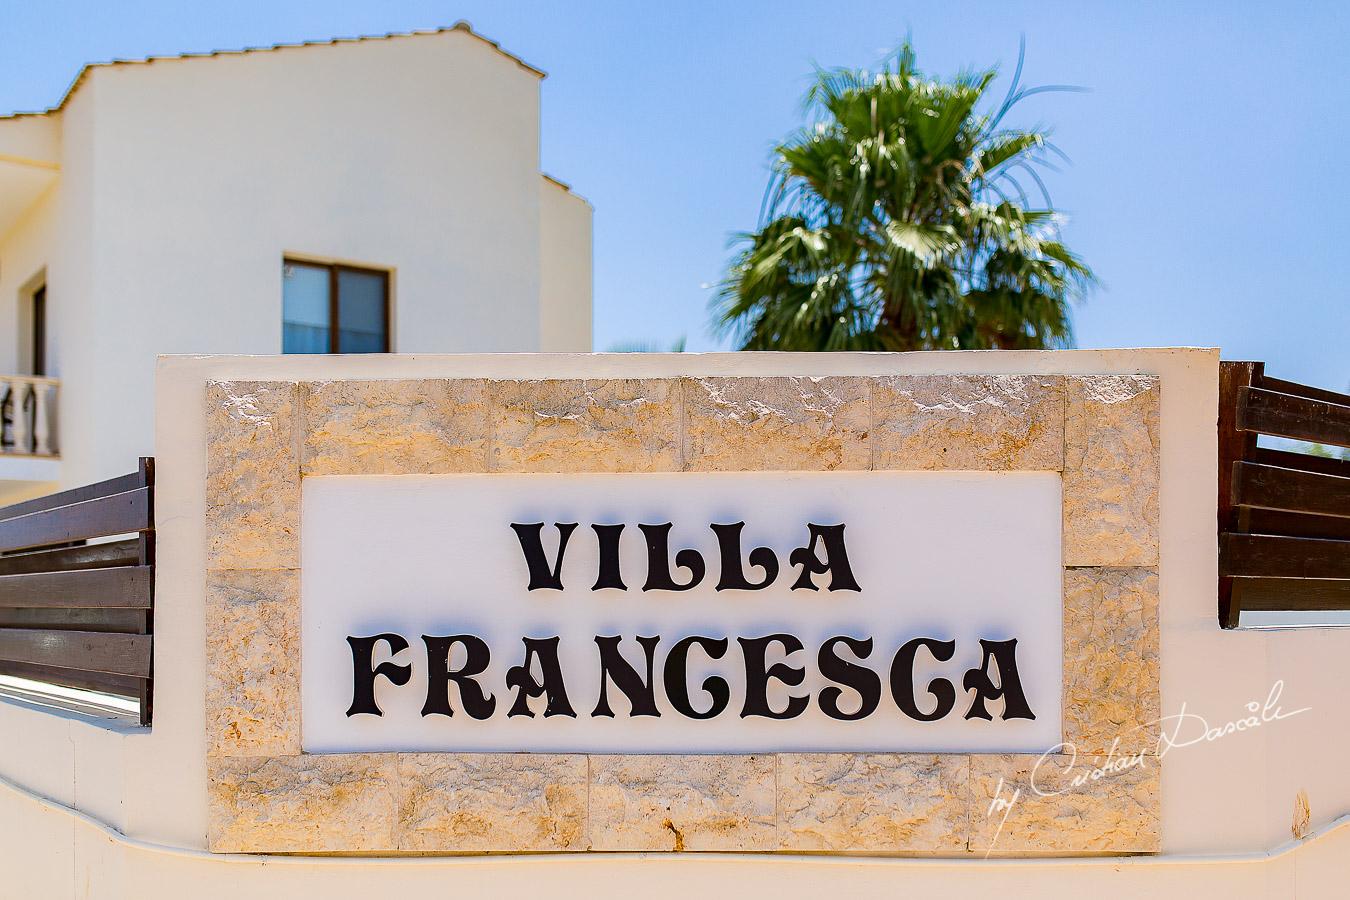 Villa Francesca in Ayia Napa photographed during a wedding in Ayia Napa by Cristian Dascalu.